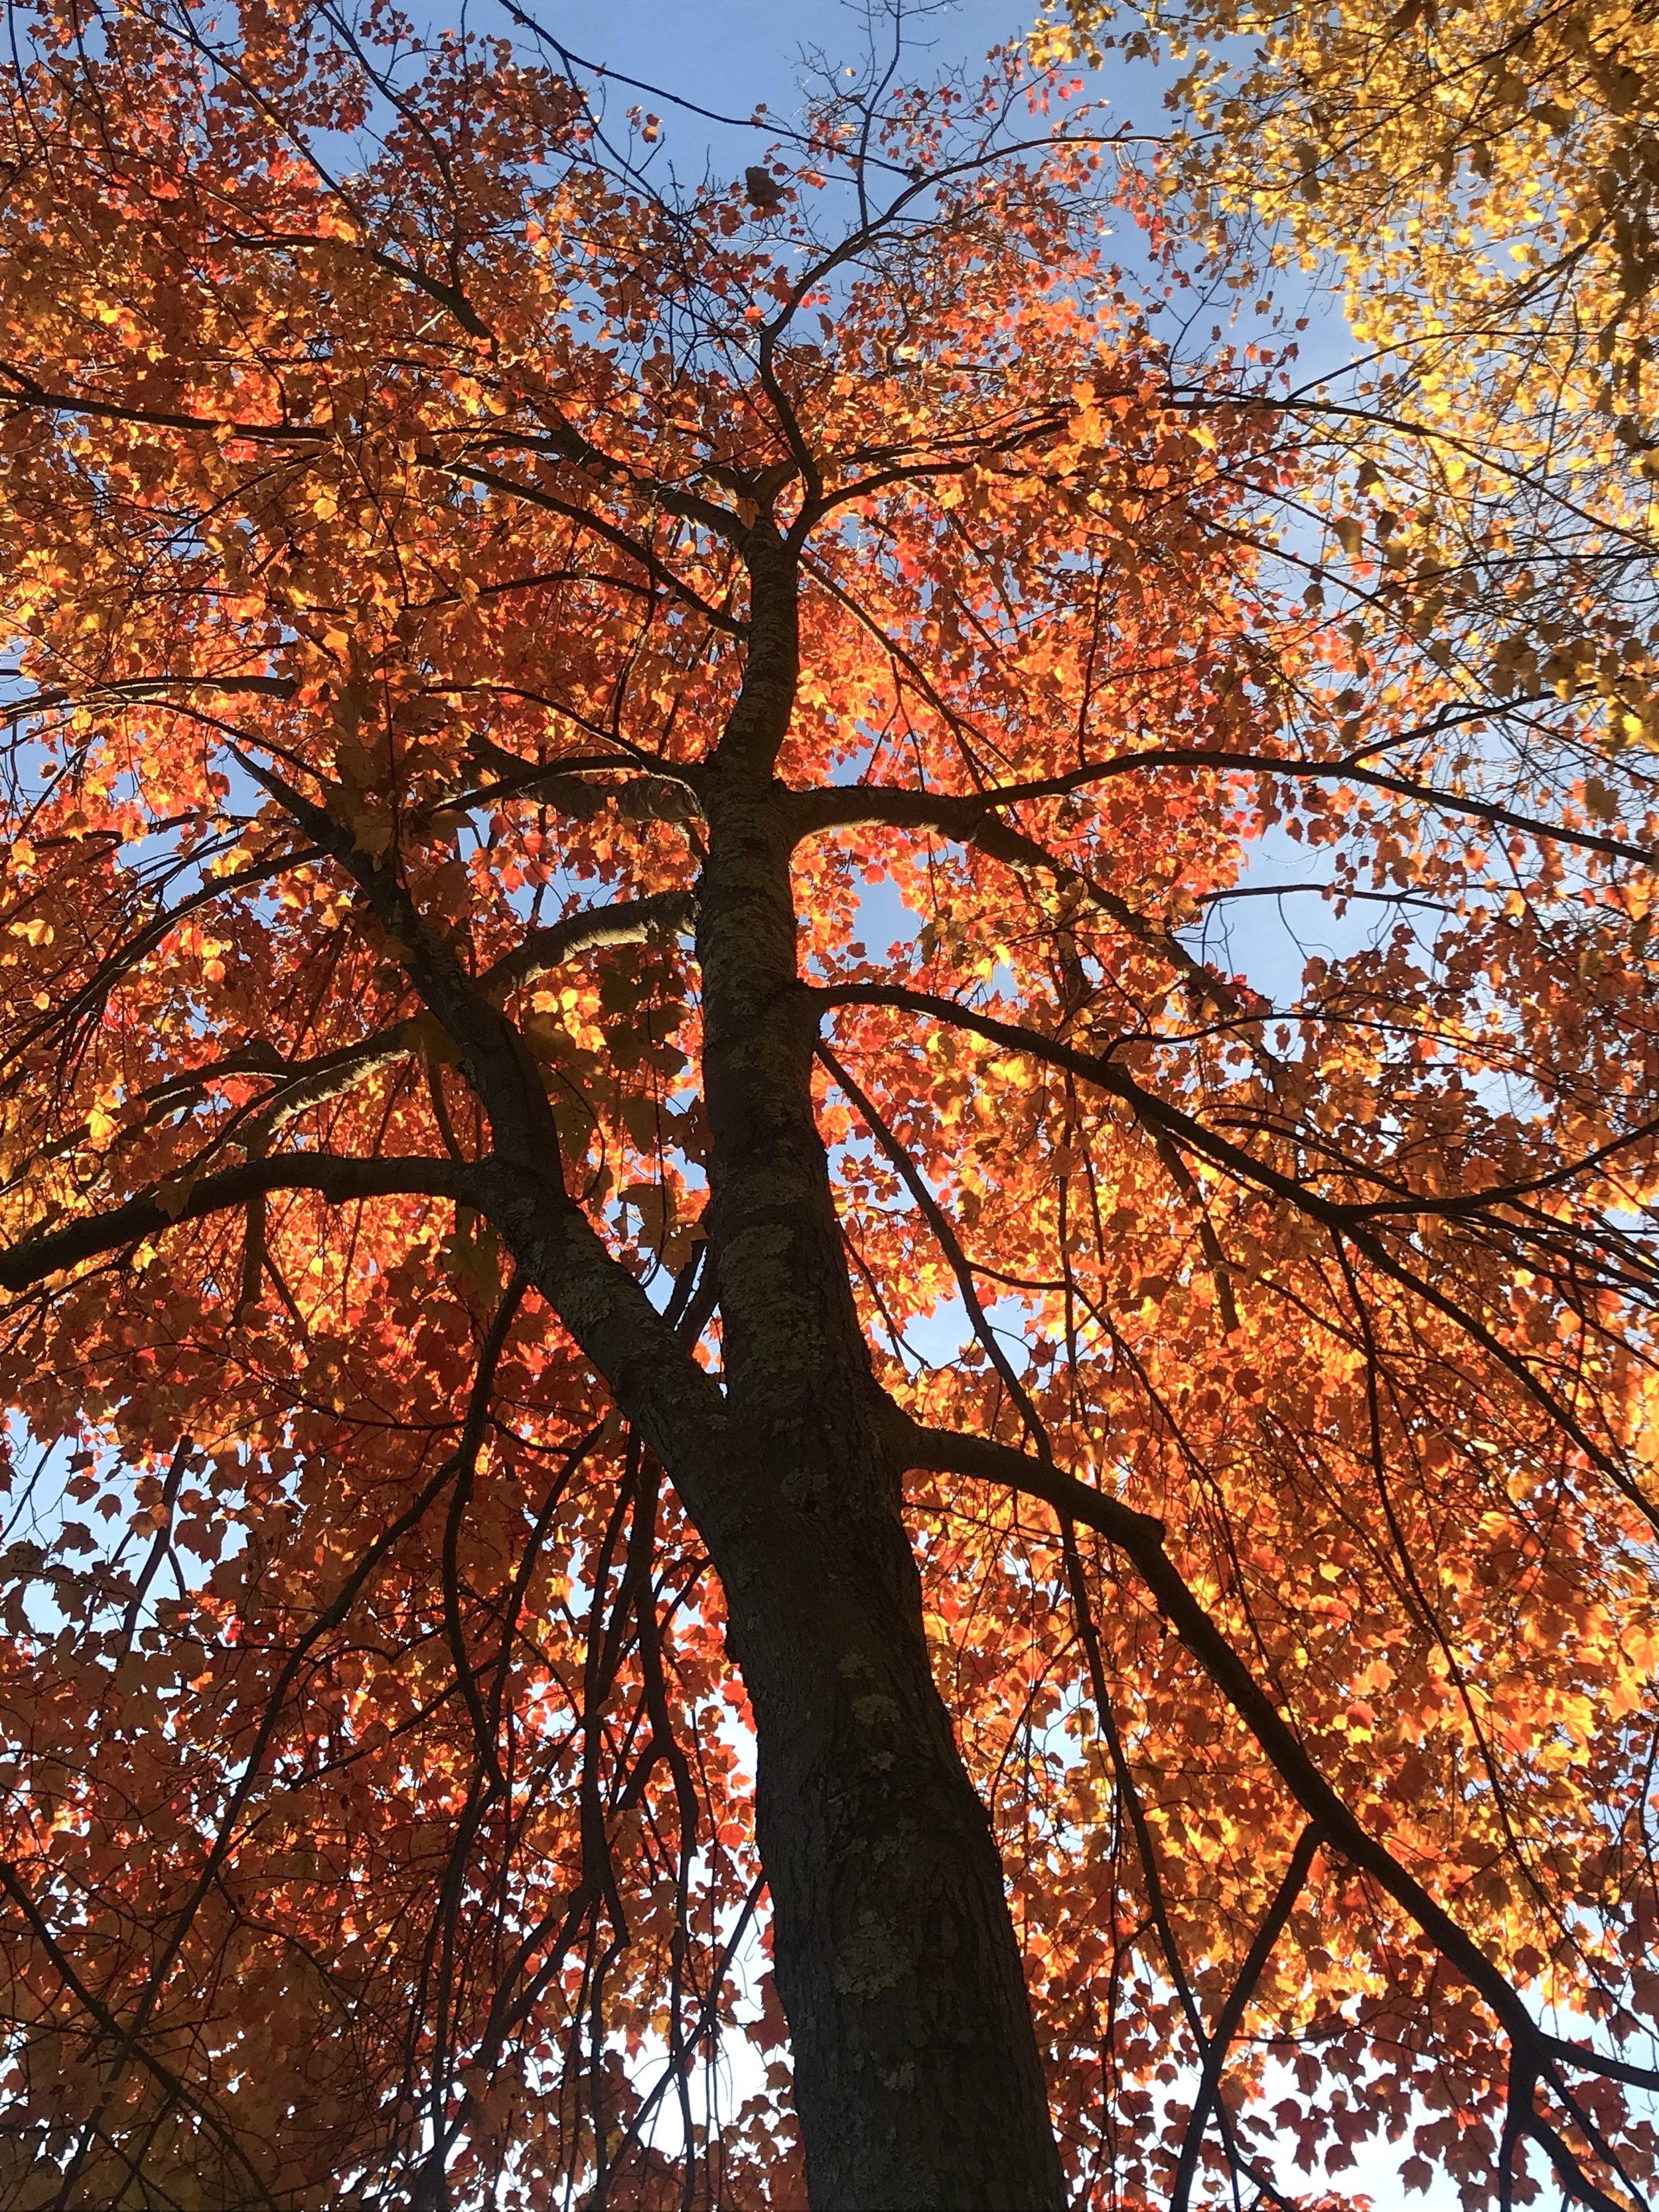 Orange Fire Tree, Charles River